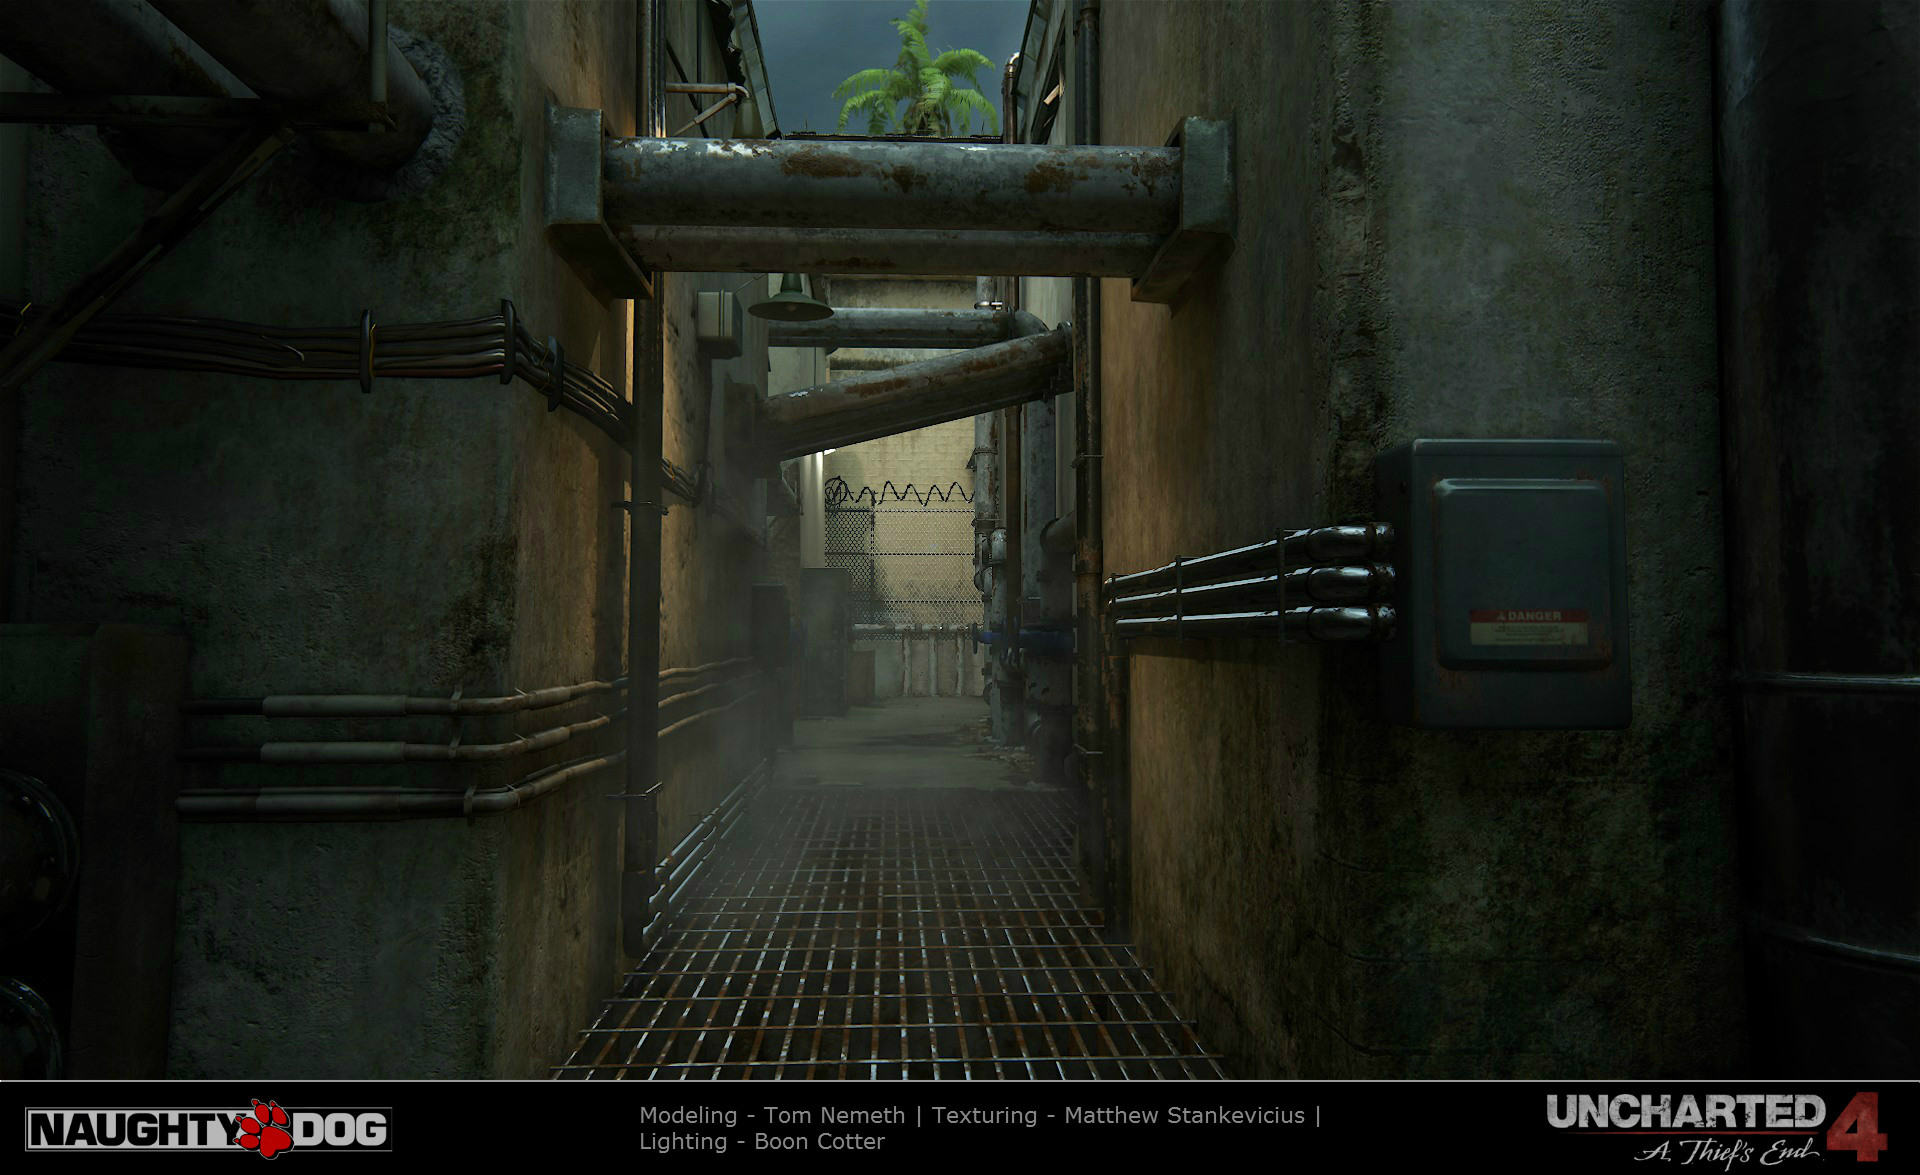 Tom nemeth prison03